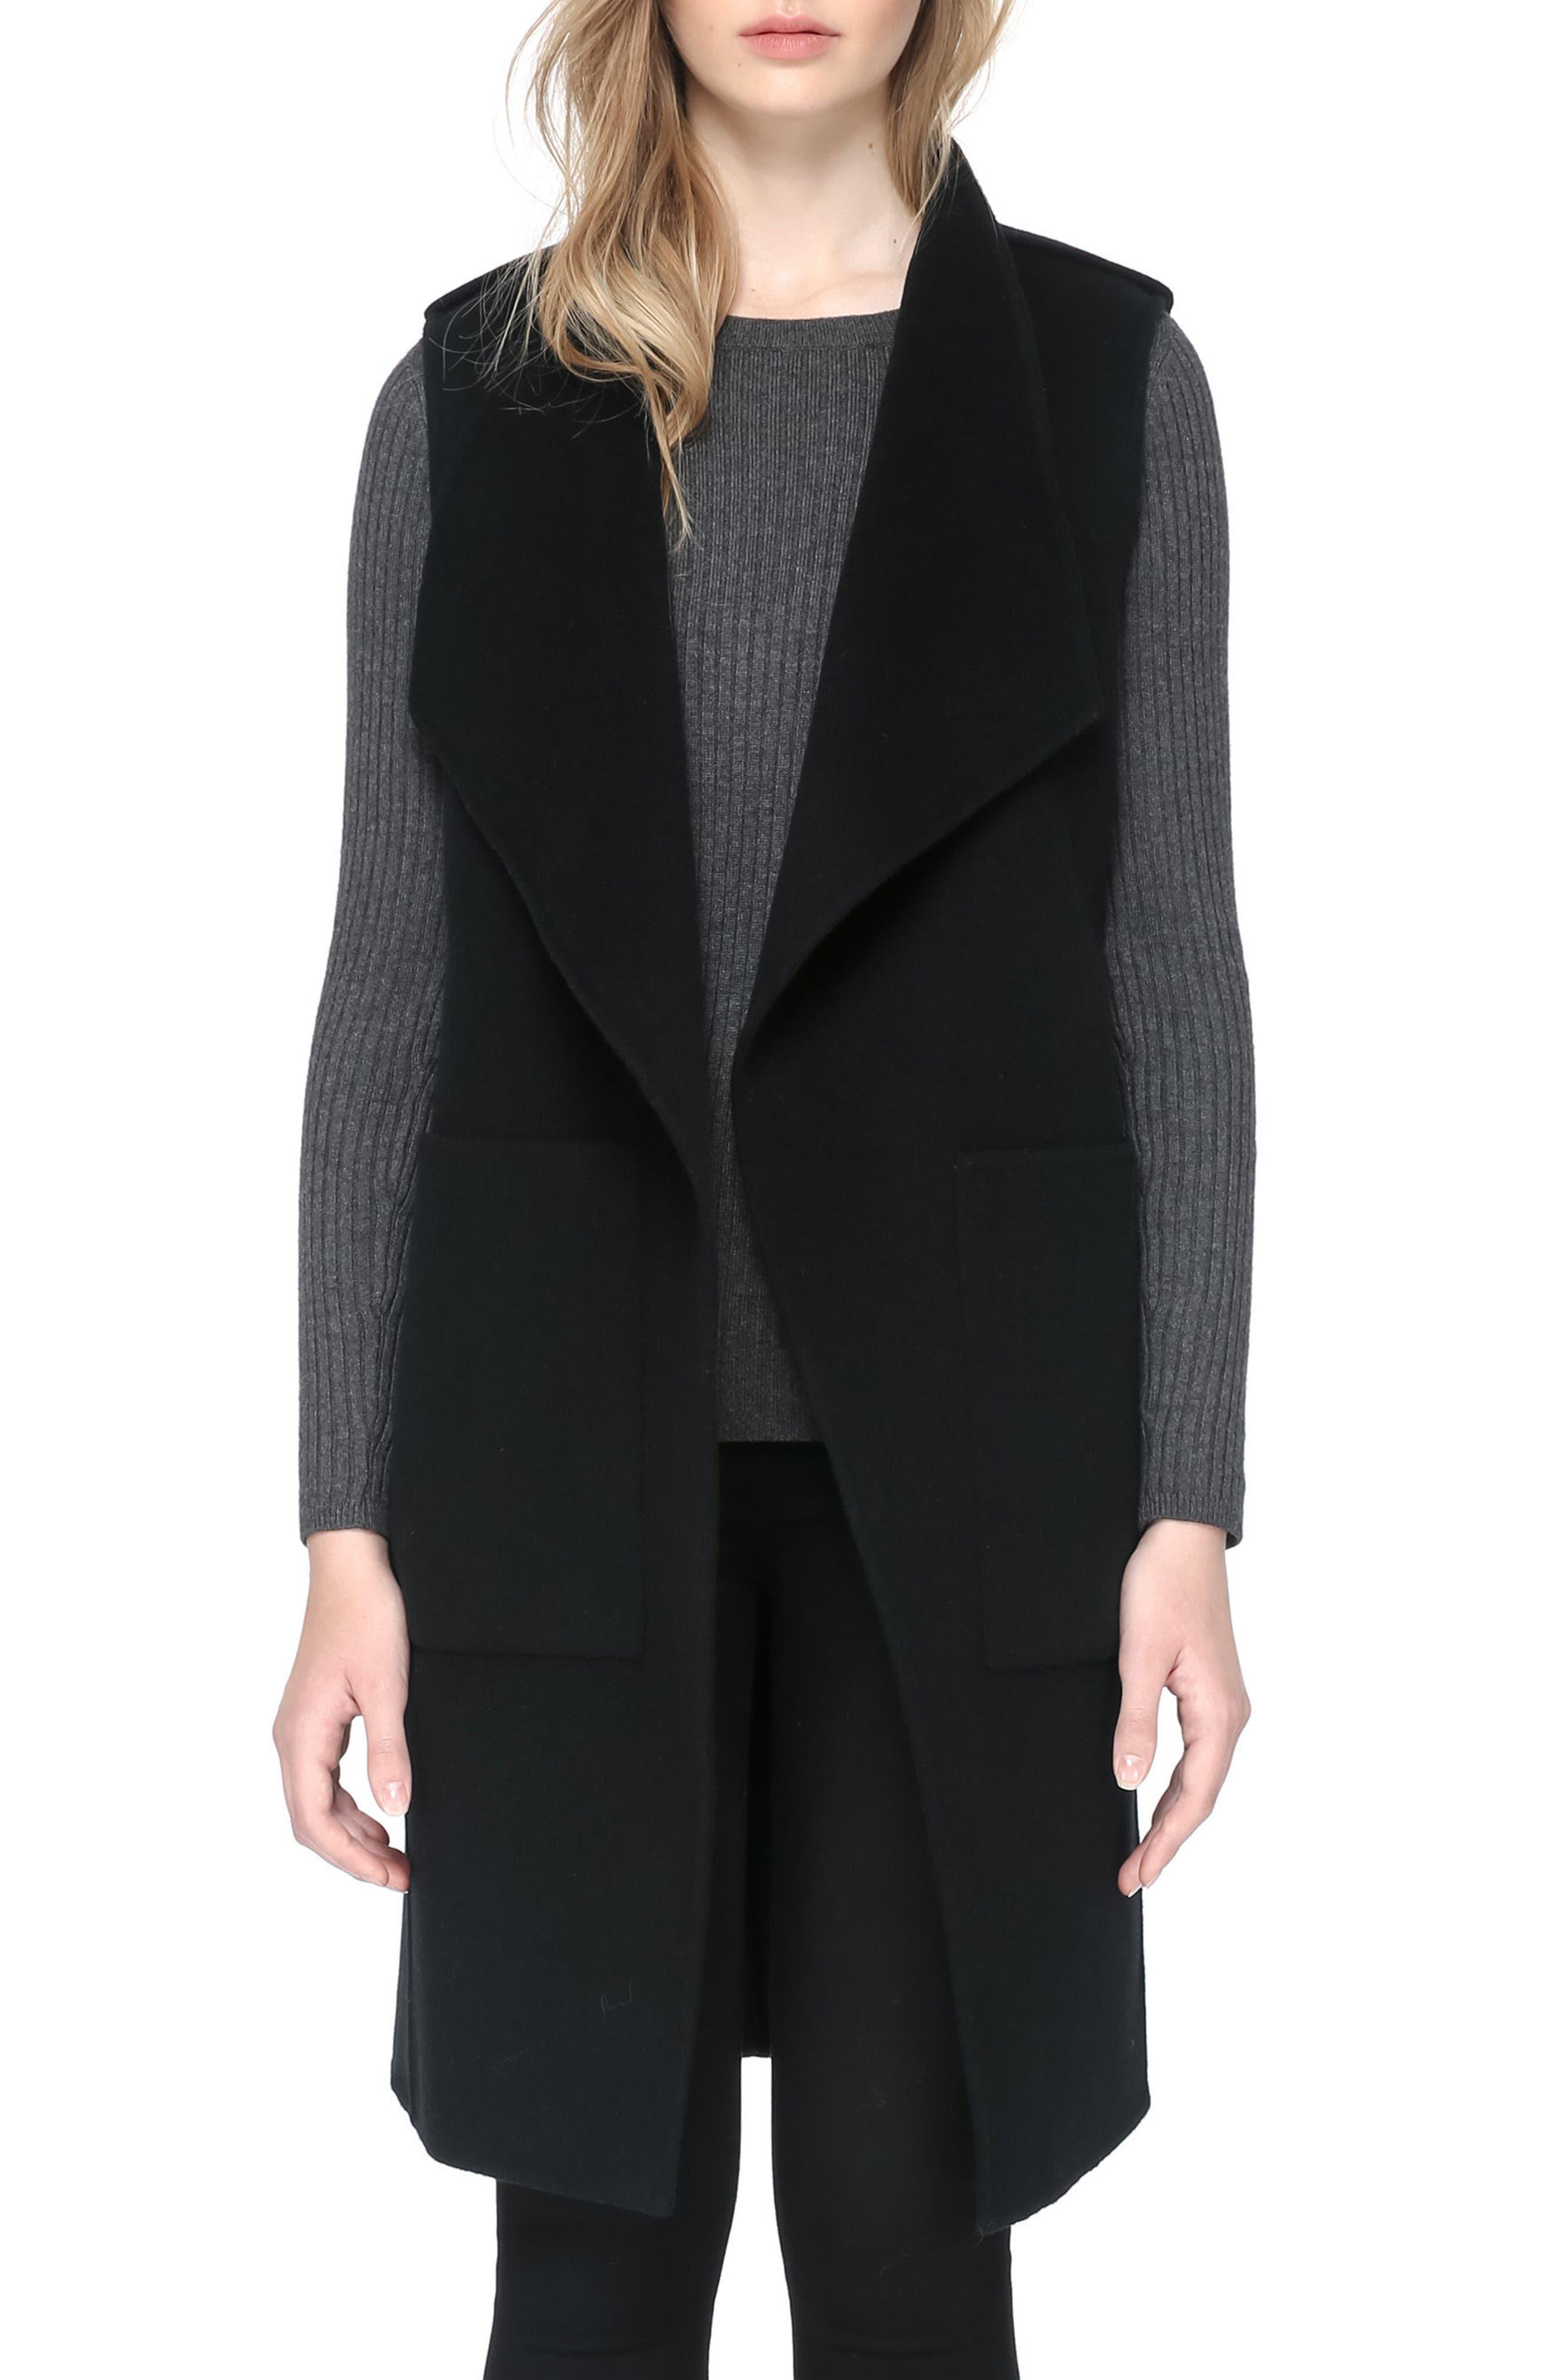 Soia & Kyo Reversible Wool Blend Vest